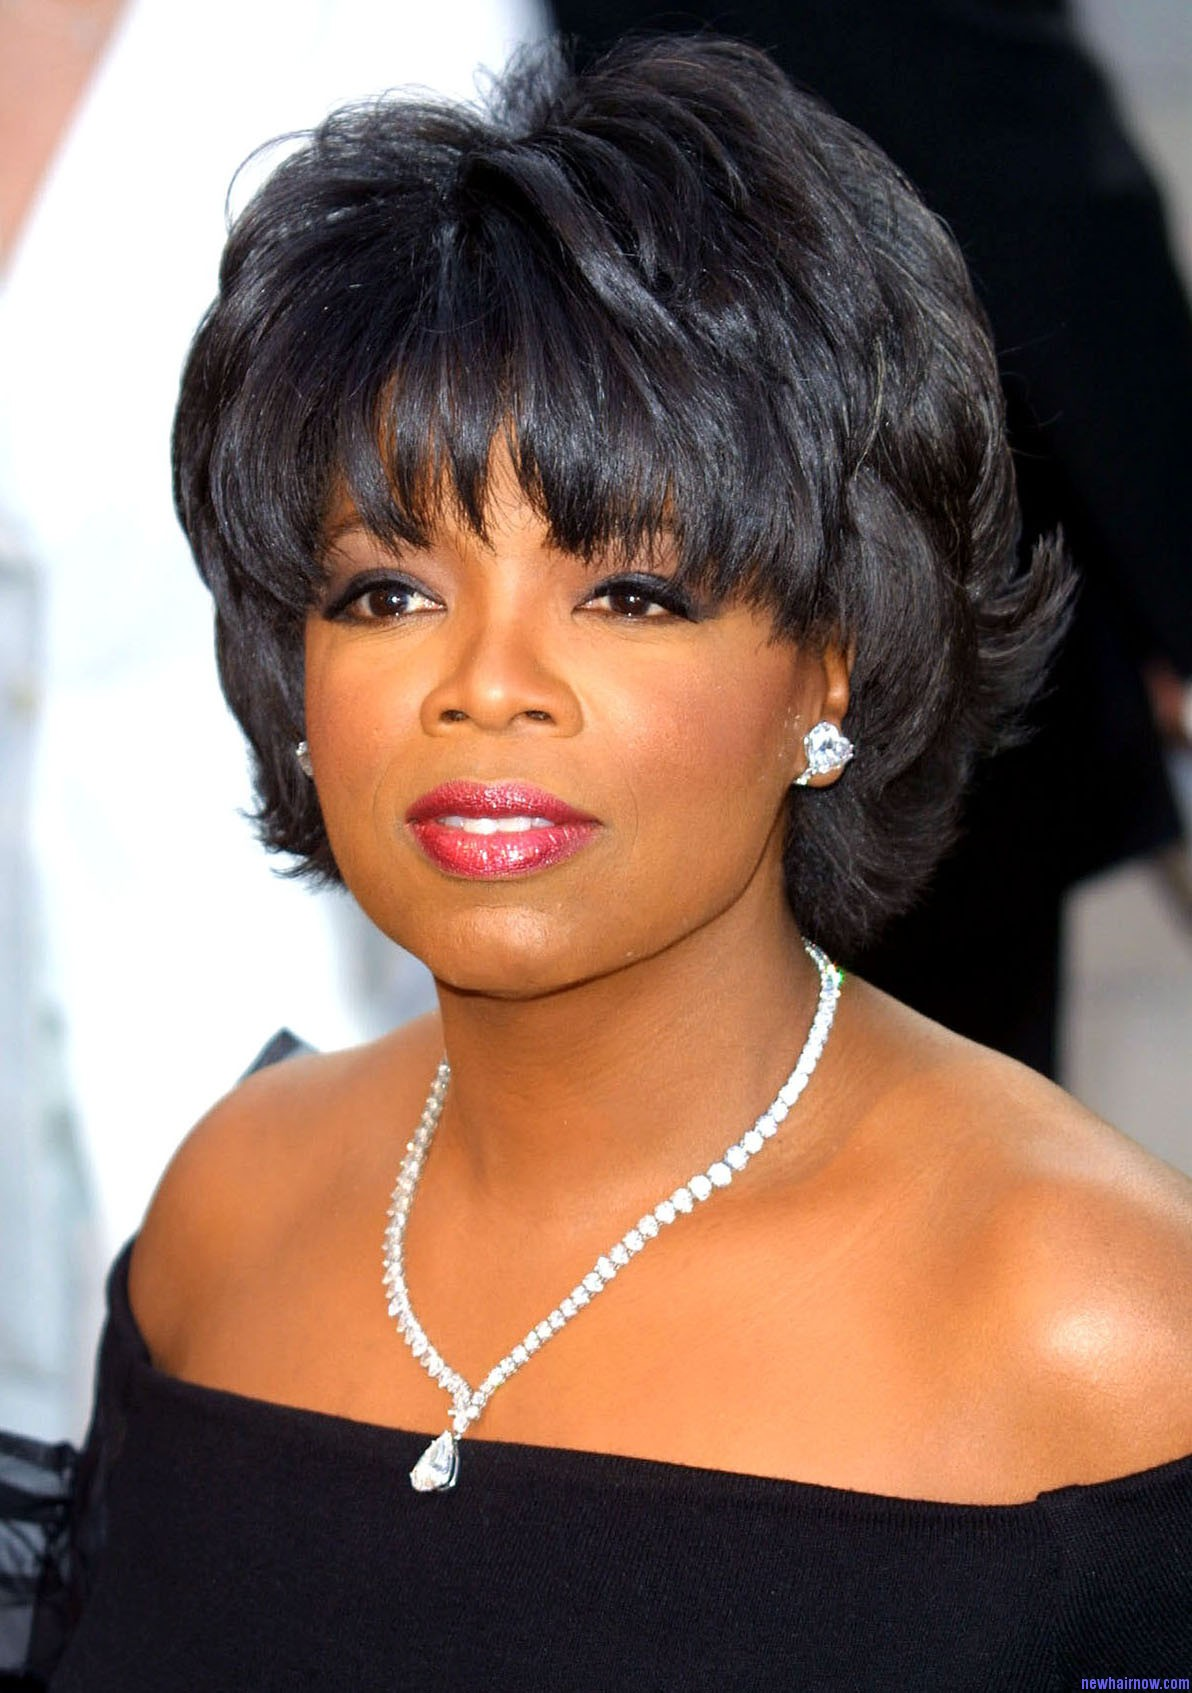 New Hairstyle Hairstyle Magazine: Oprah Winfrey Hairstyle